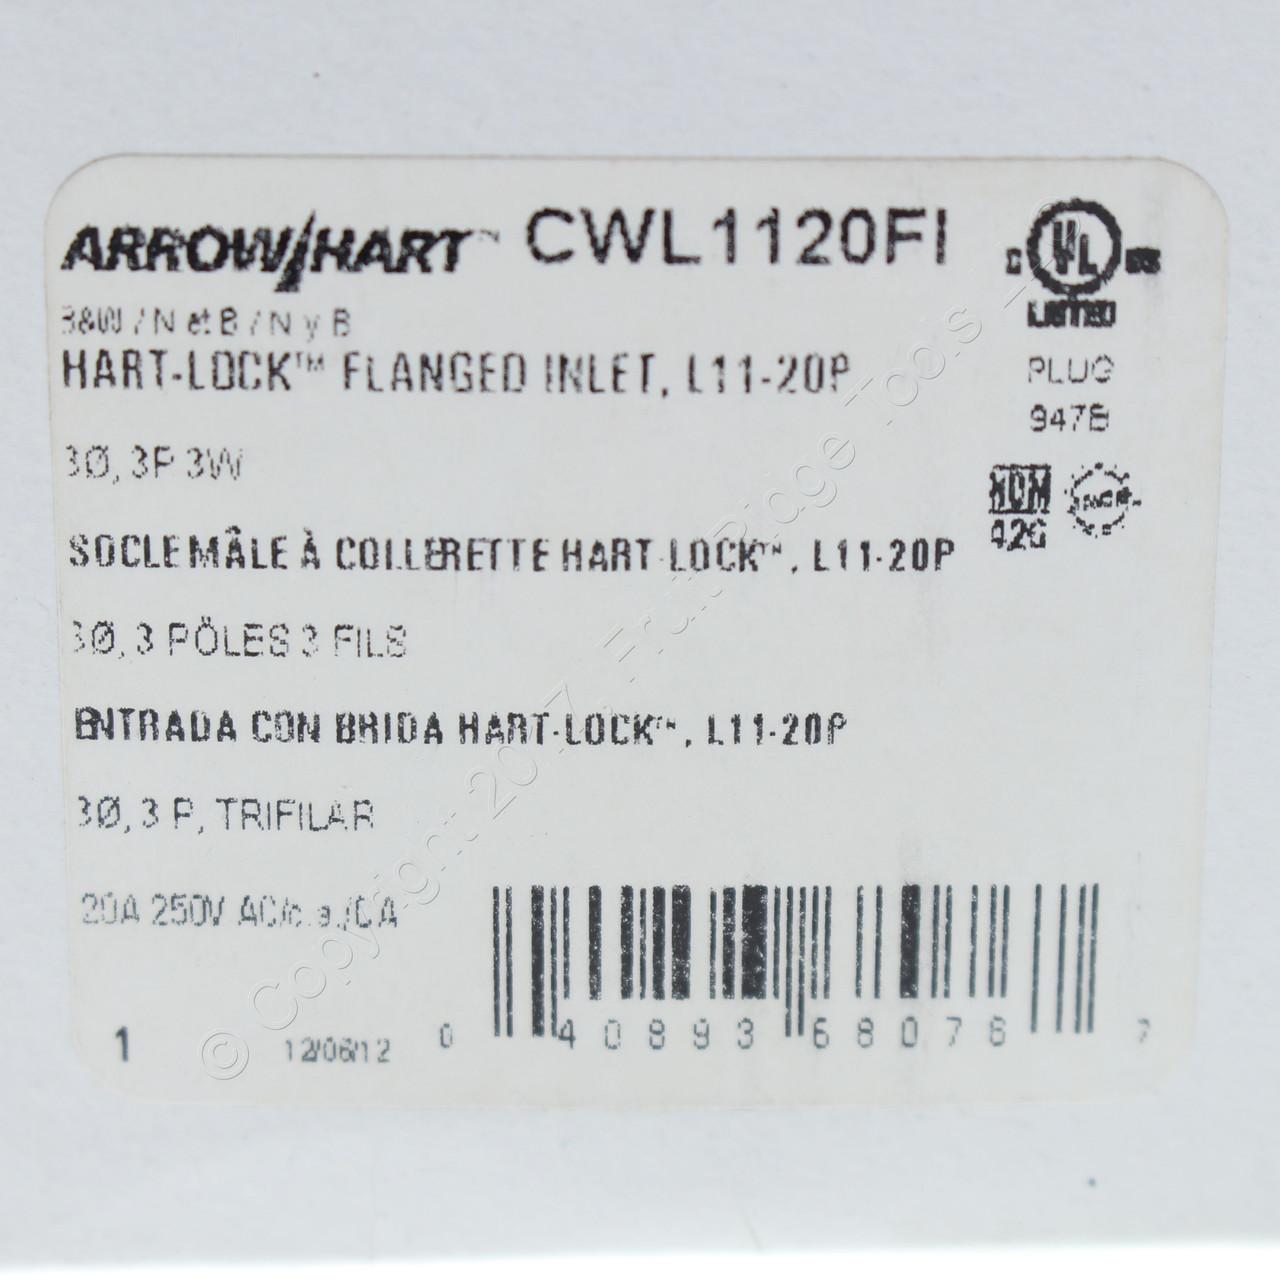 Cooper L7-20P Twist Turn Locking Connector Plug NEMA 20A 277V Lot of 10